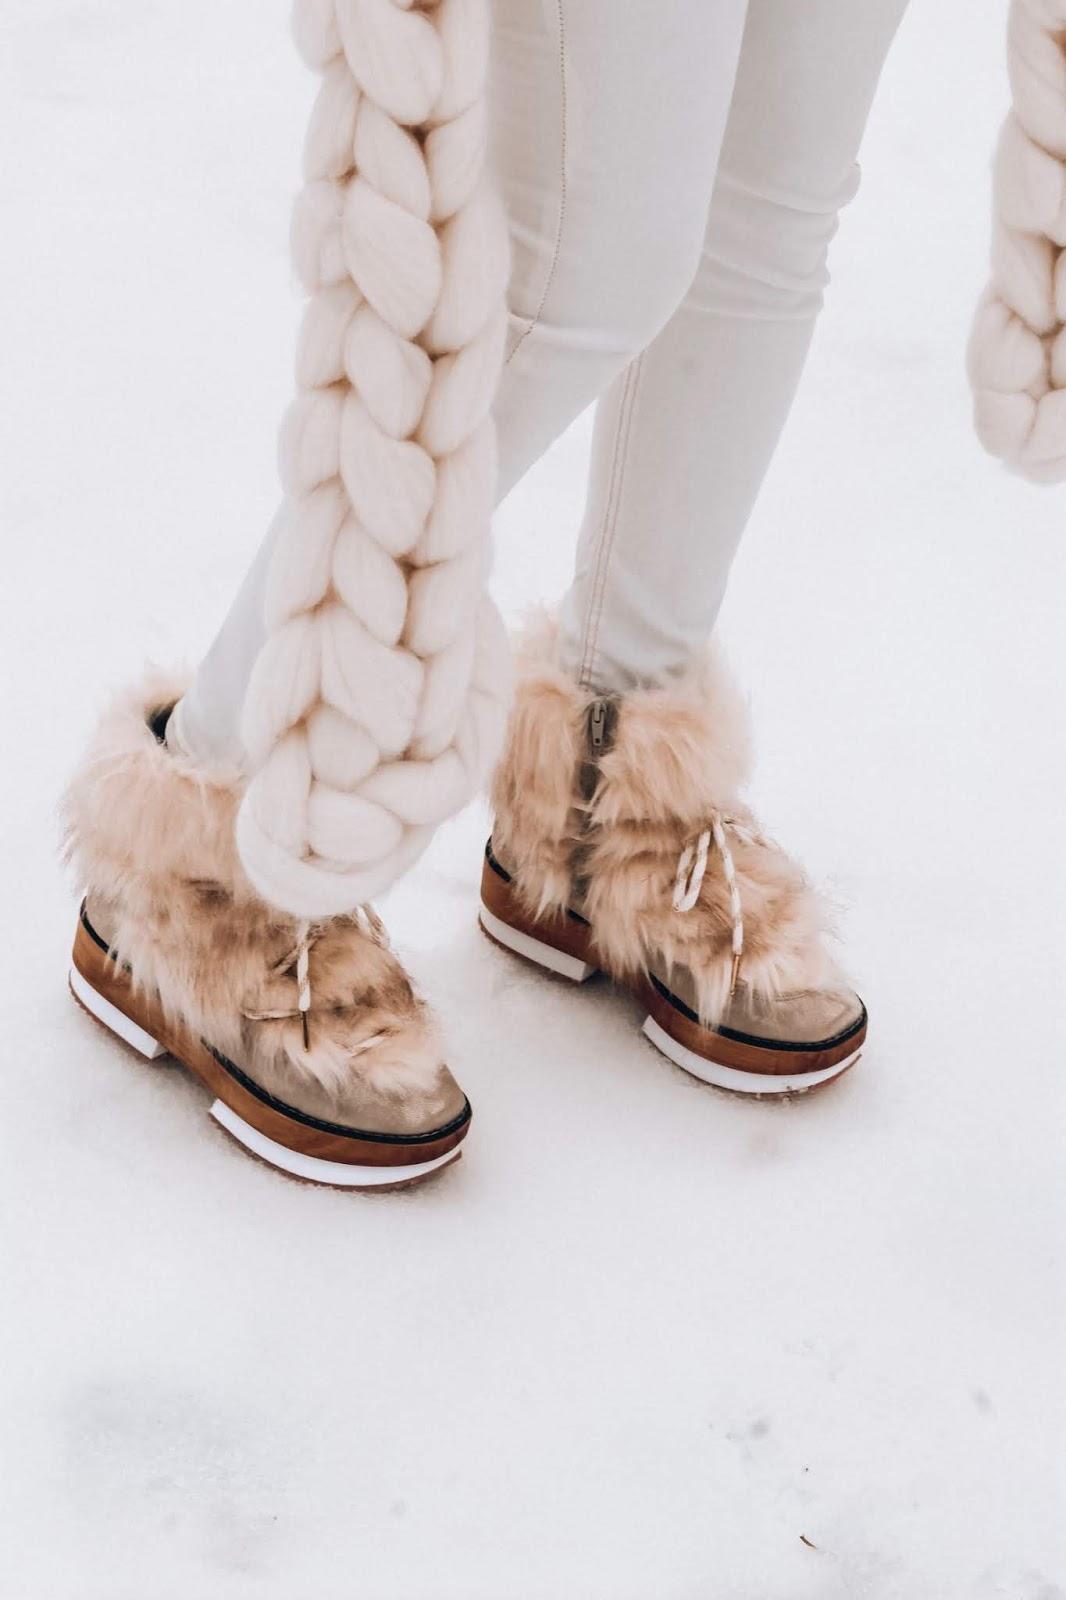 comprar botas estilo aprés ski